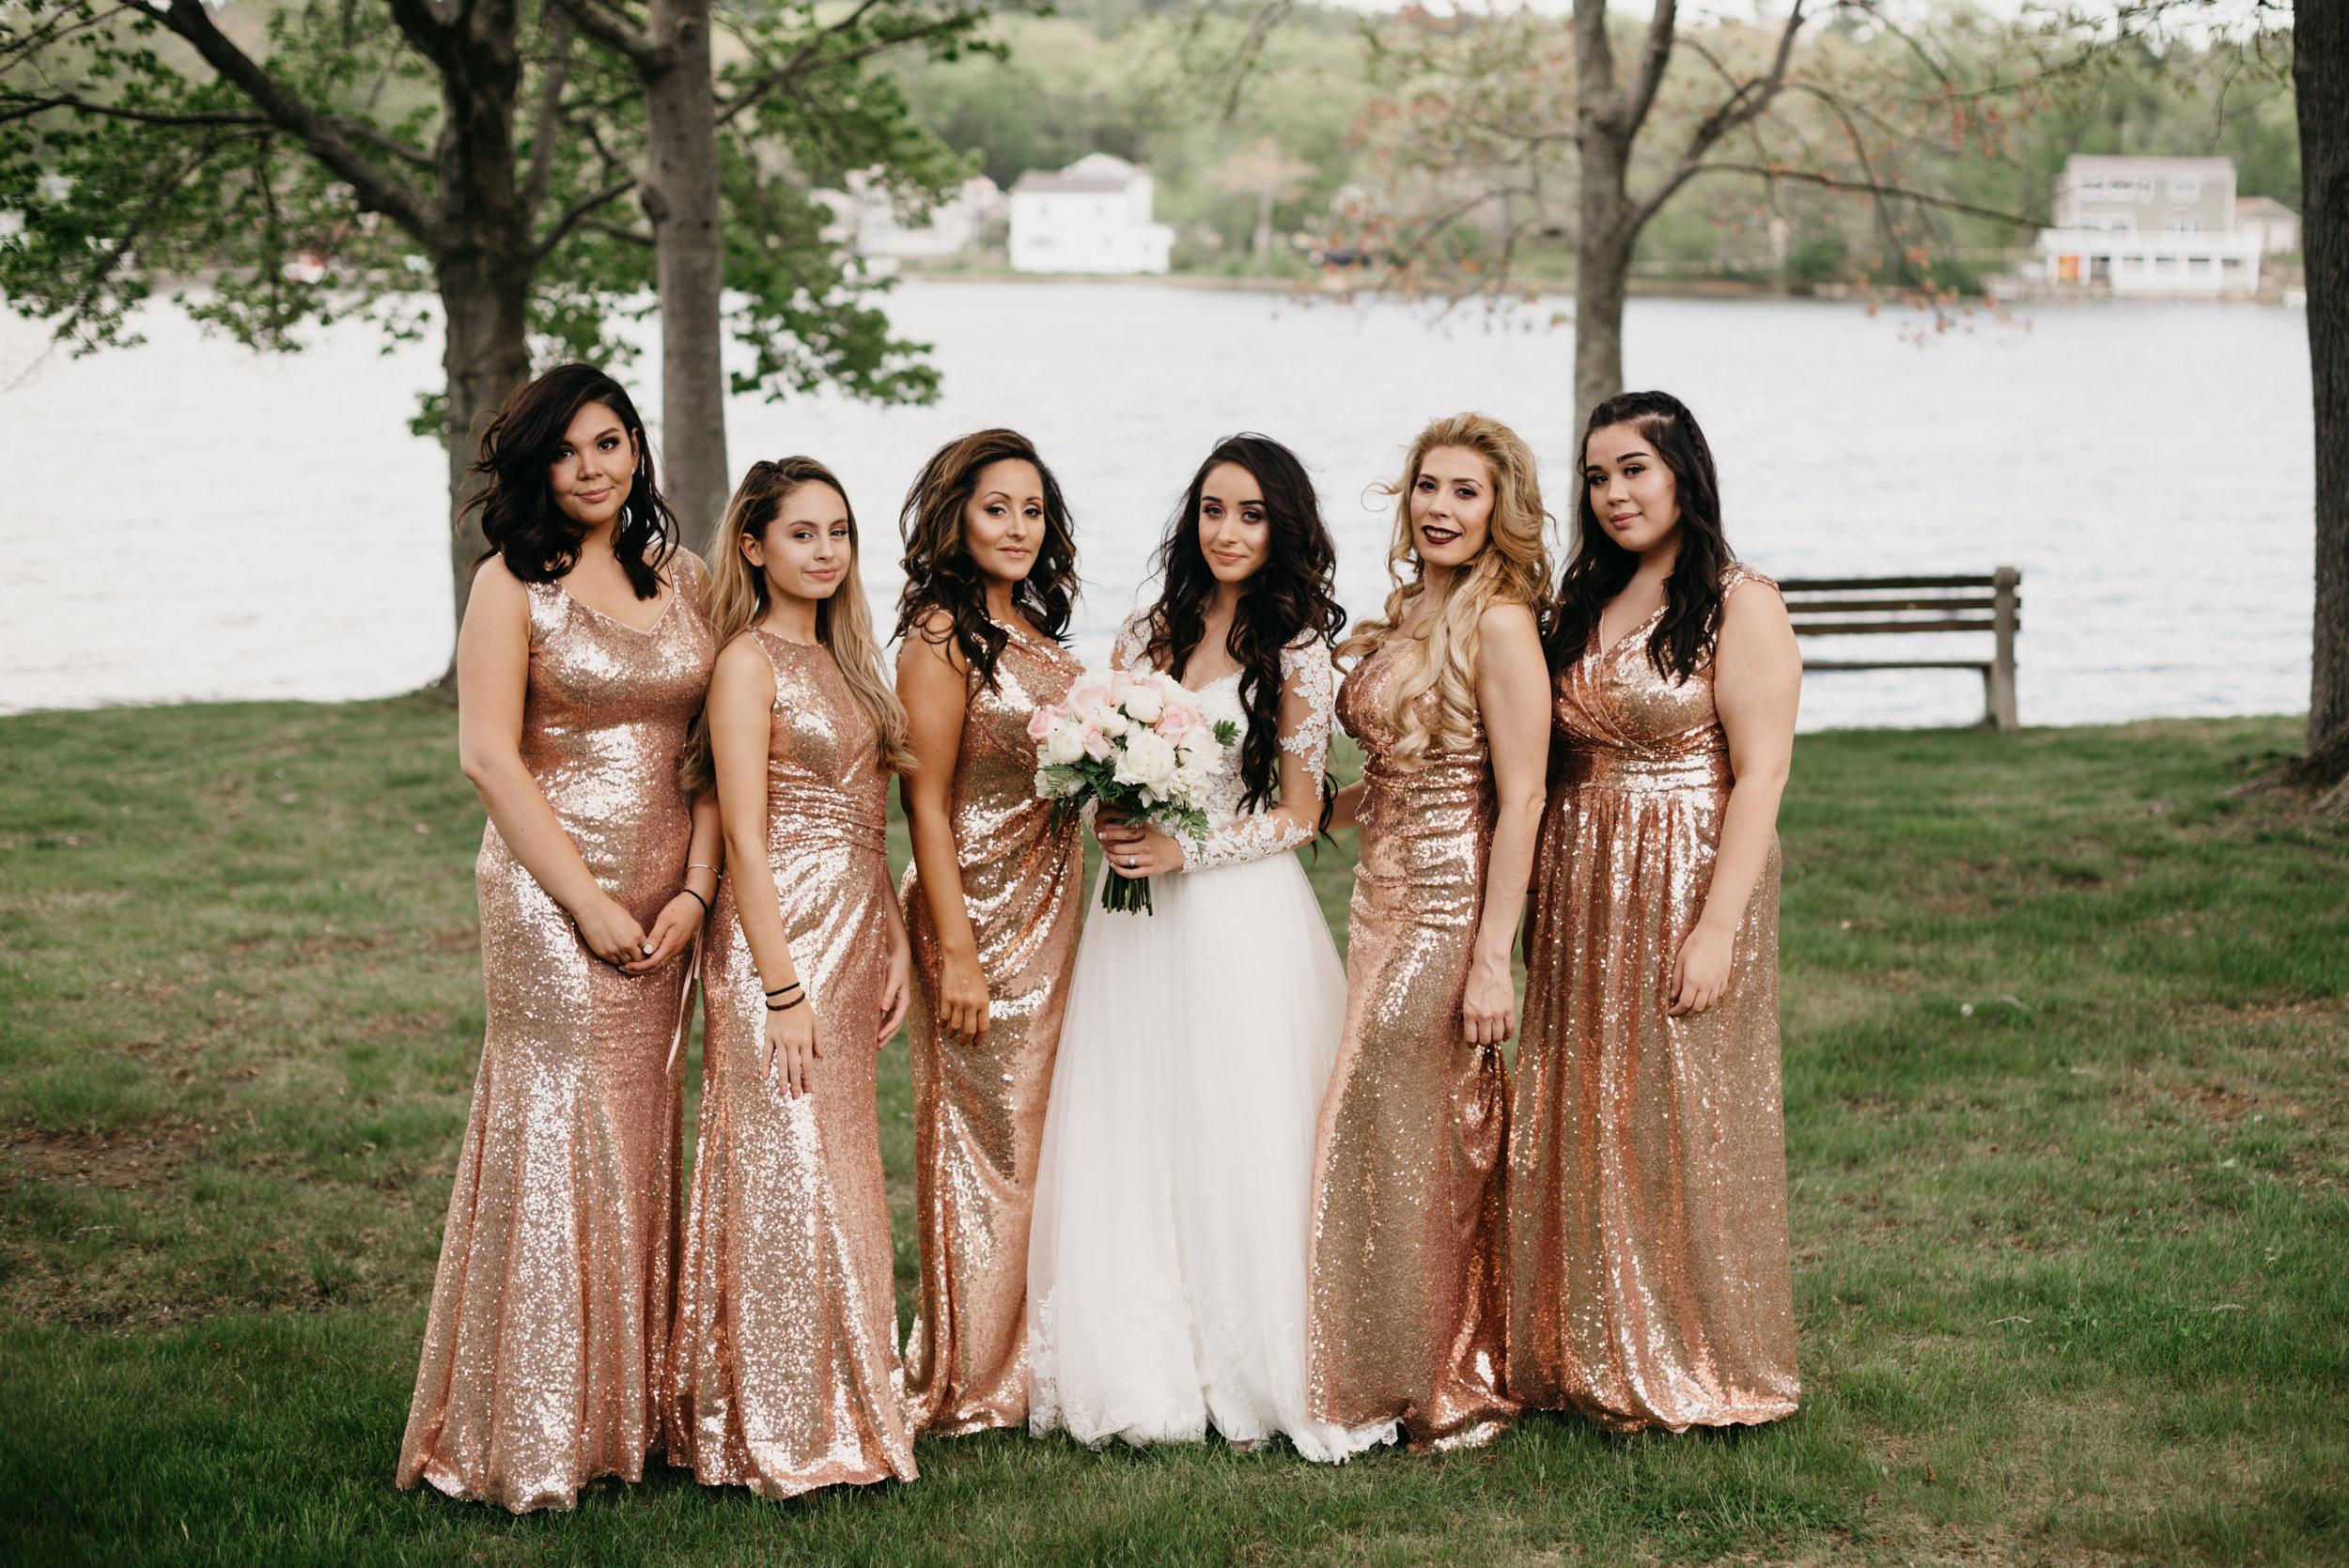 Barch-Massachusetts-Lakeside Tent Wedding-Western Massachusetts Wedding Photographer-00500.jpg